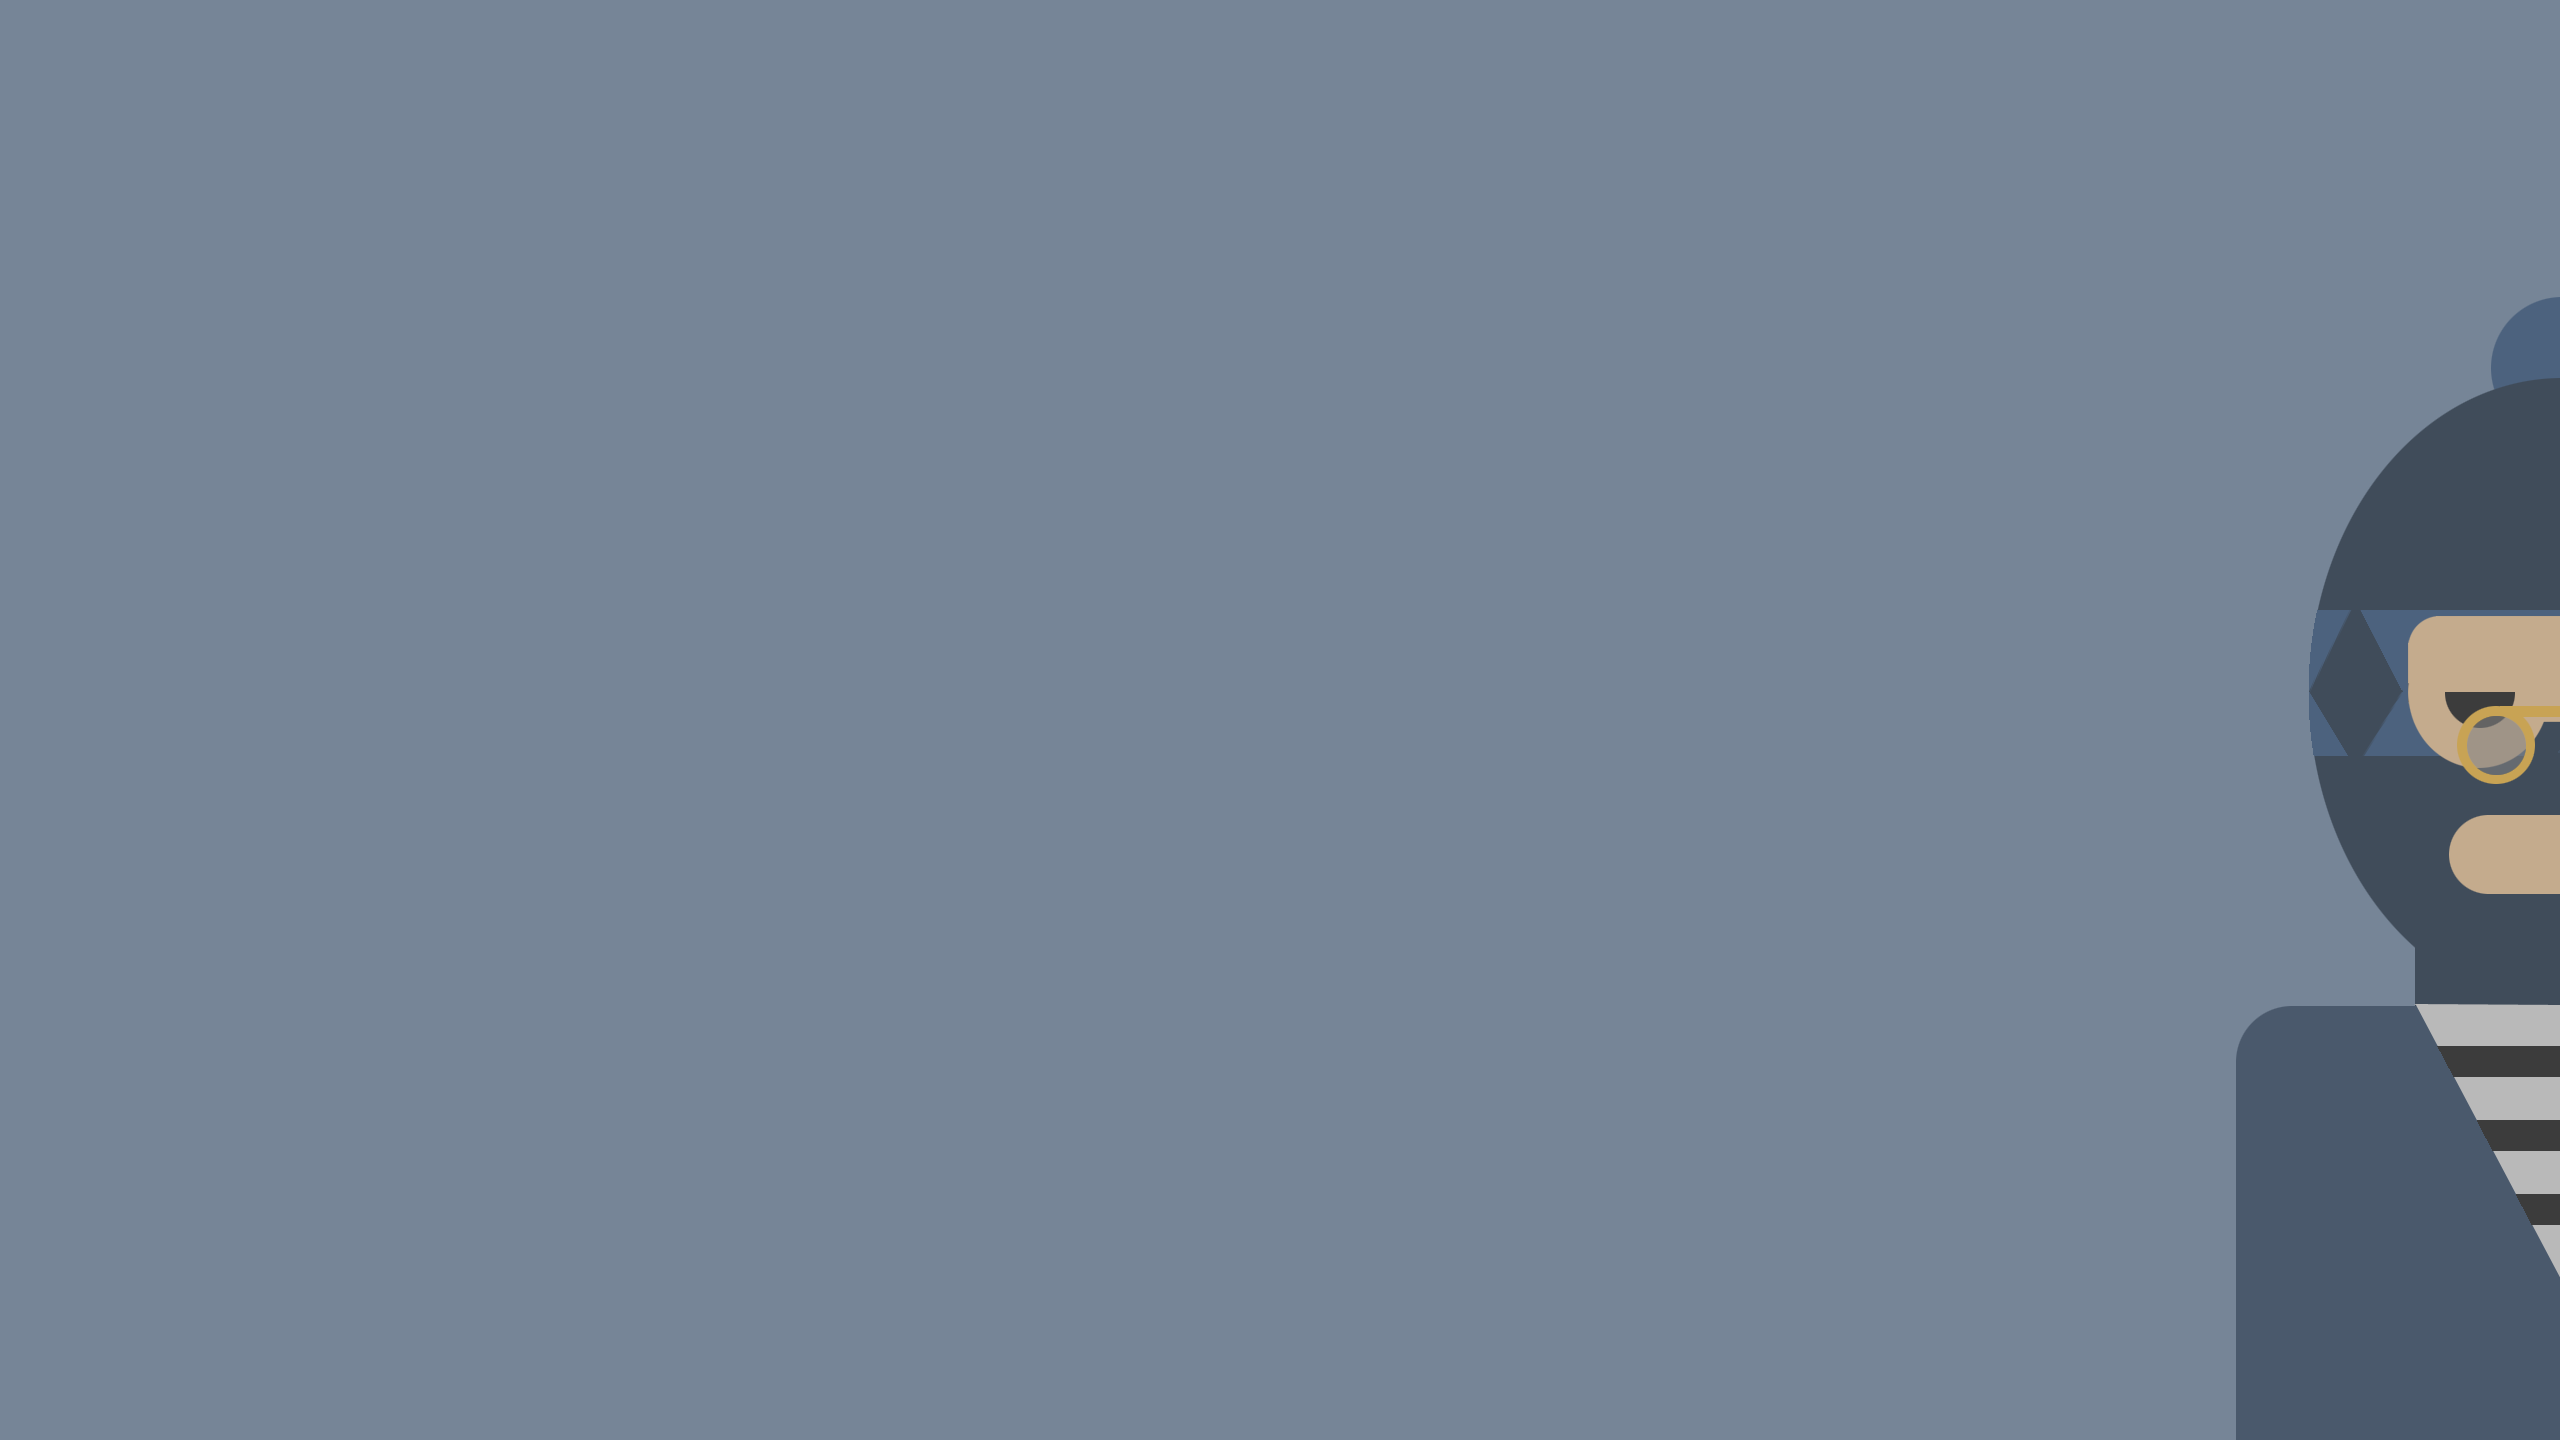 I made a minimal wallpaper of my Spy loadout tf2 2560x1440